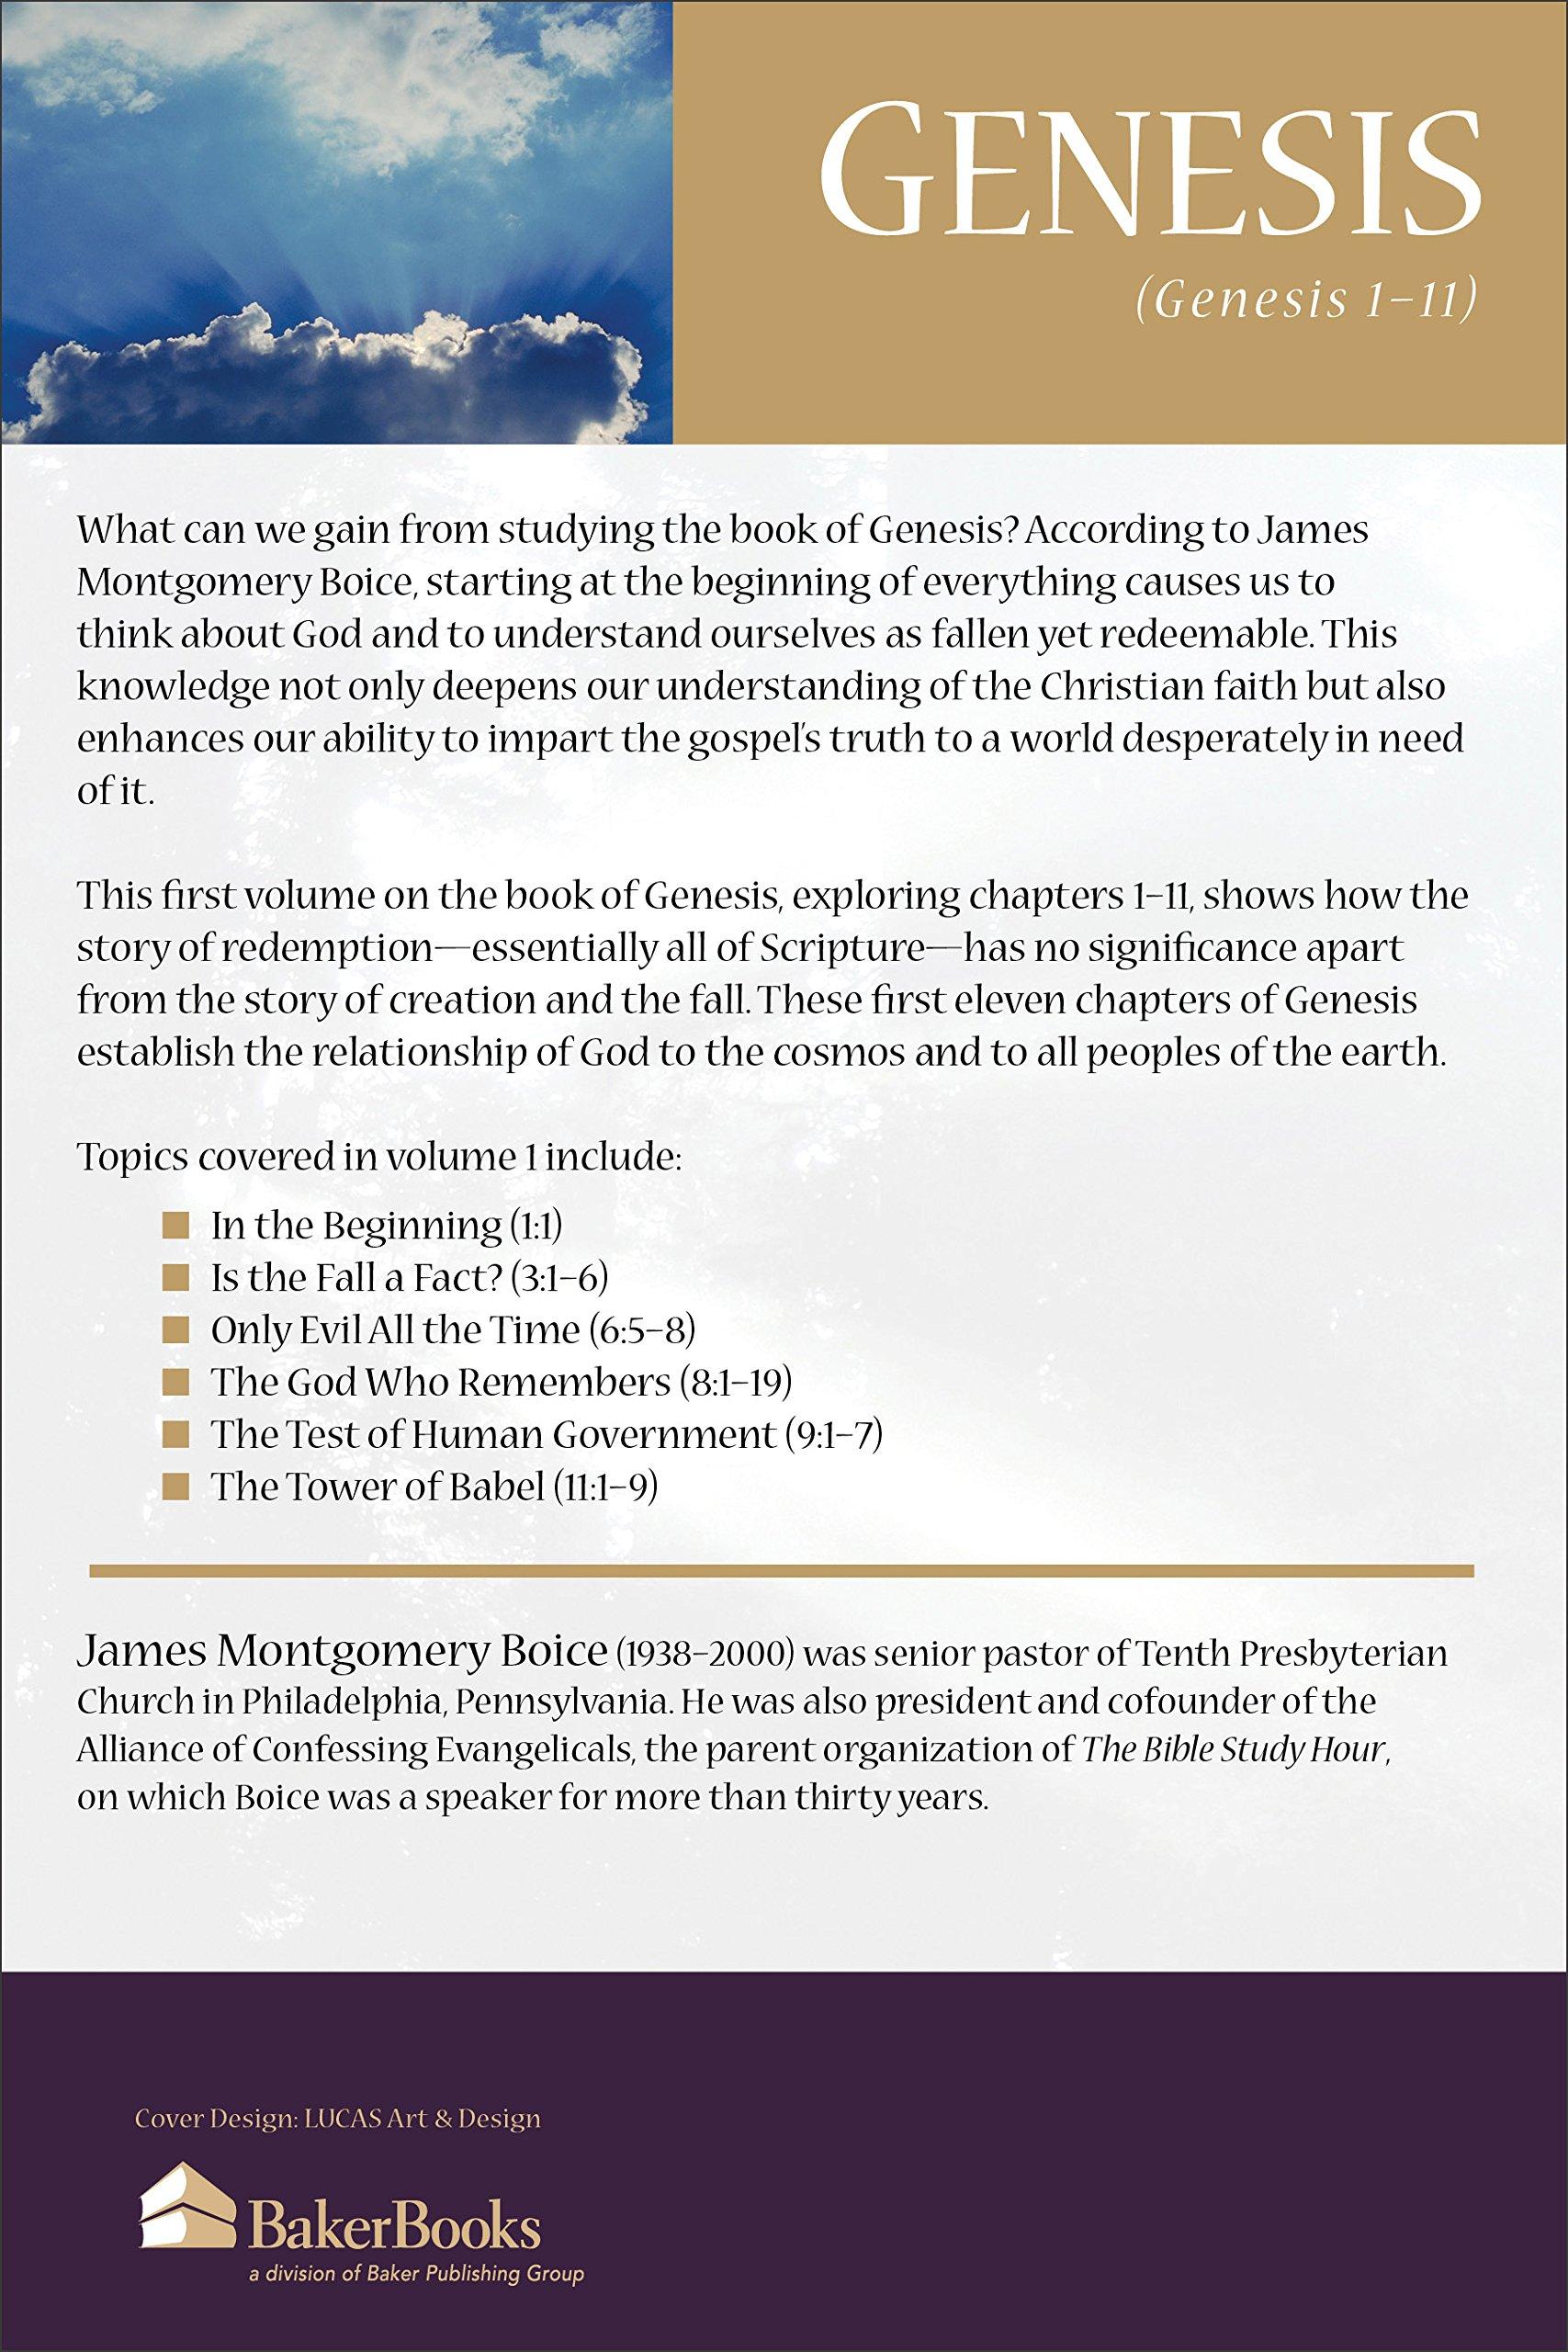 genesis an expositional commentary vol 1 genesis 1 11 james